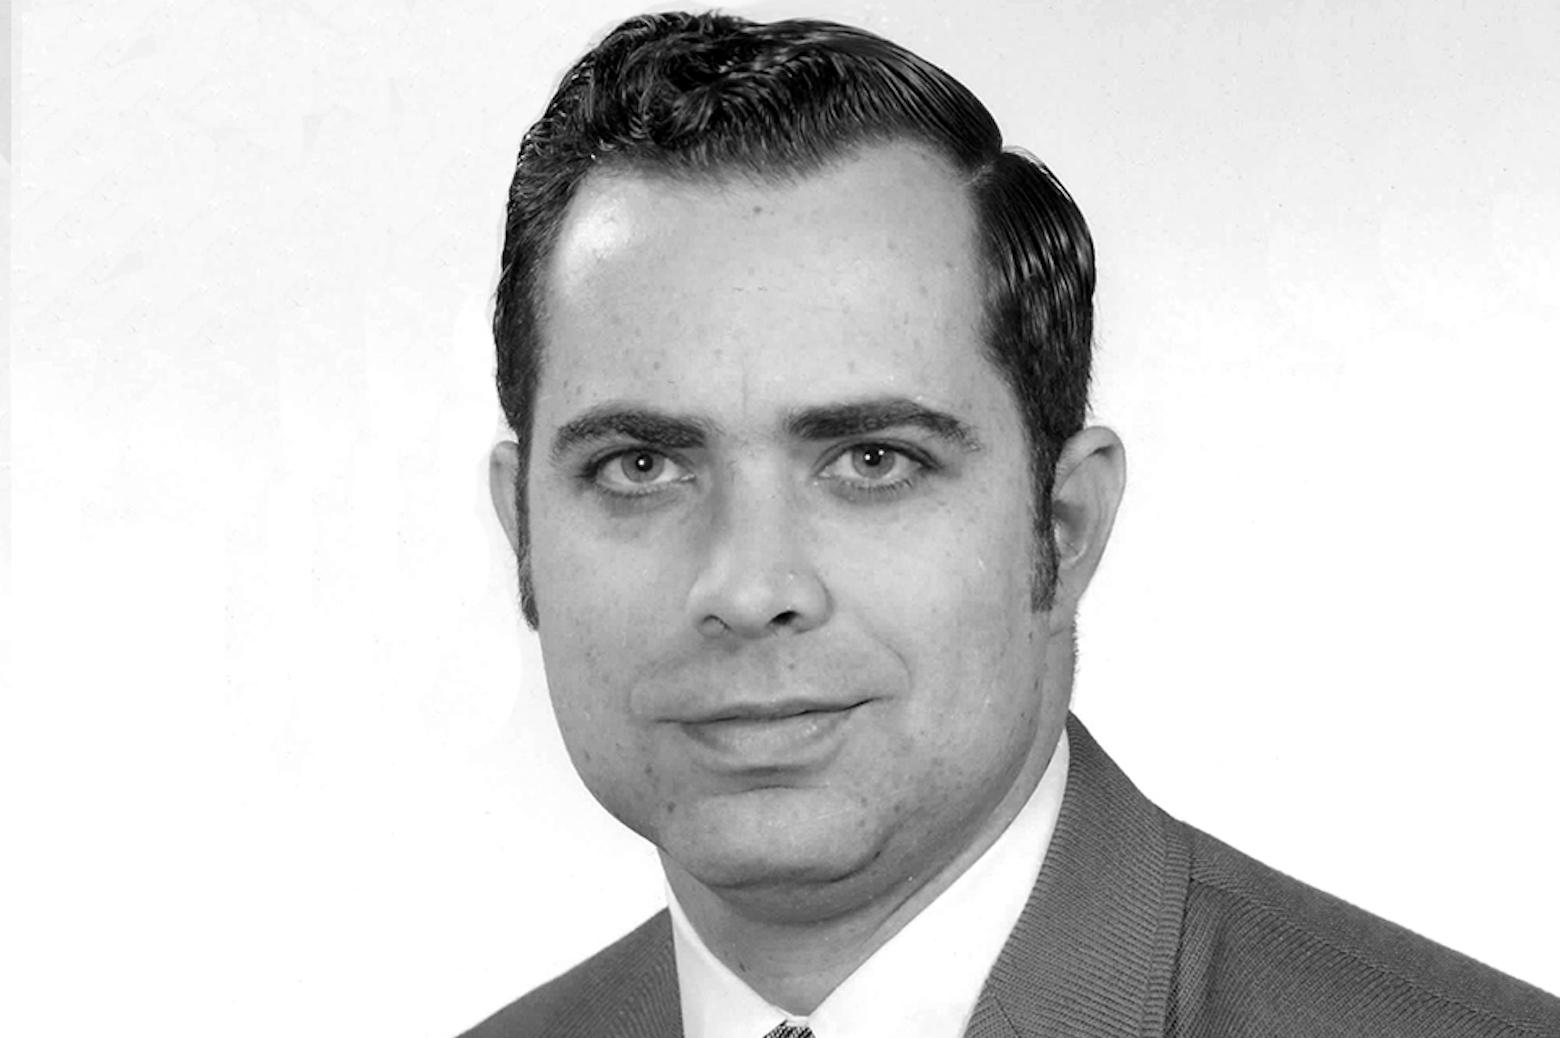 Portrait of Kensall Wise